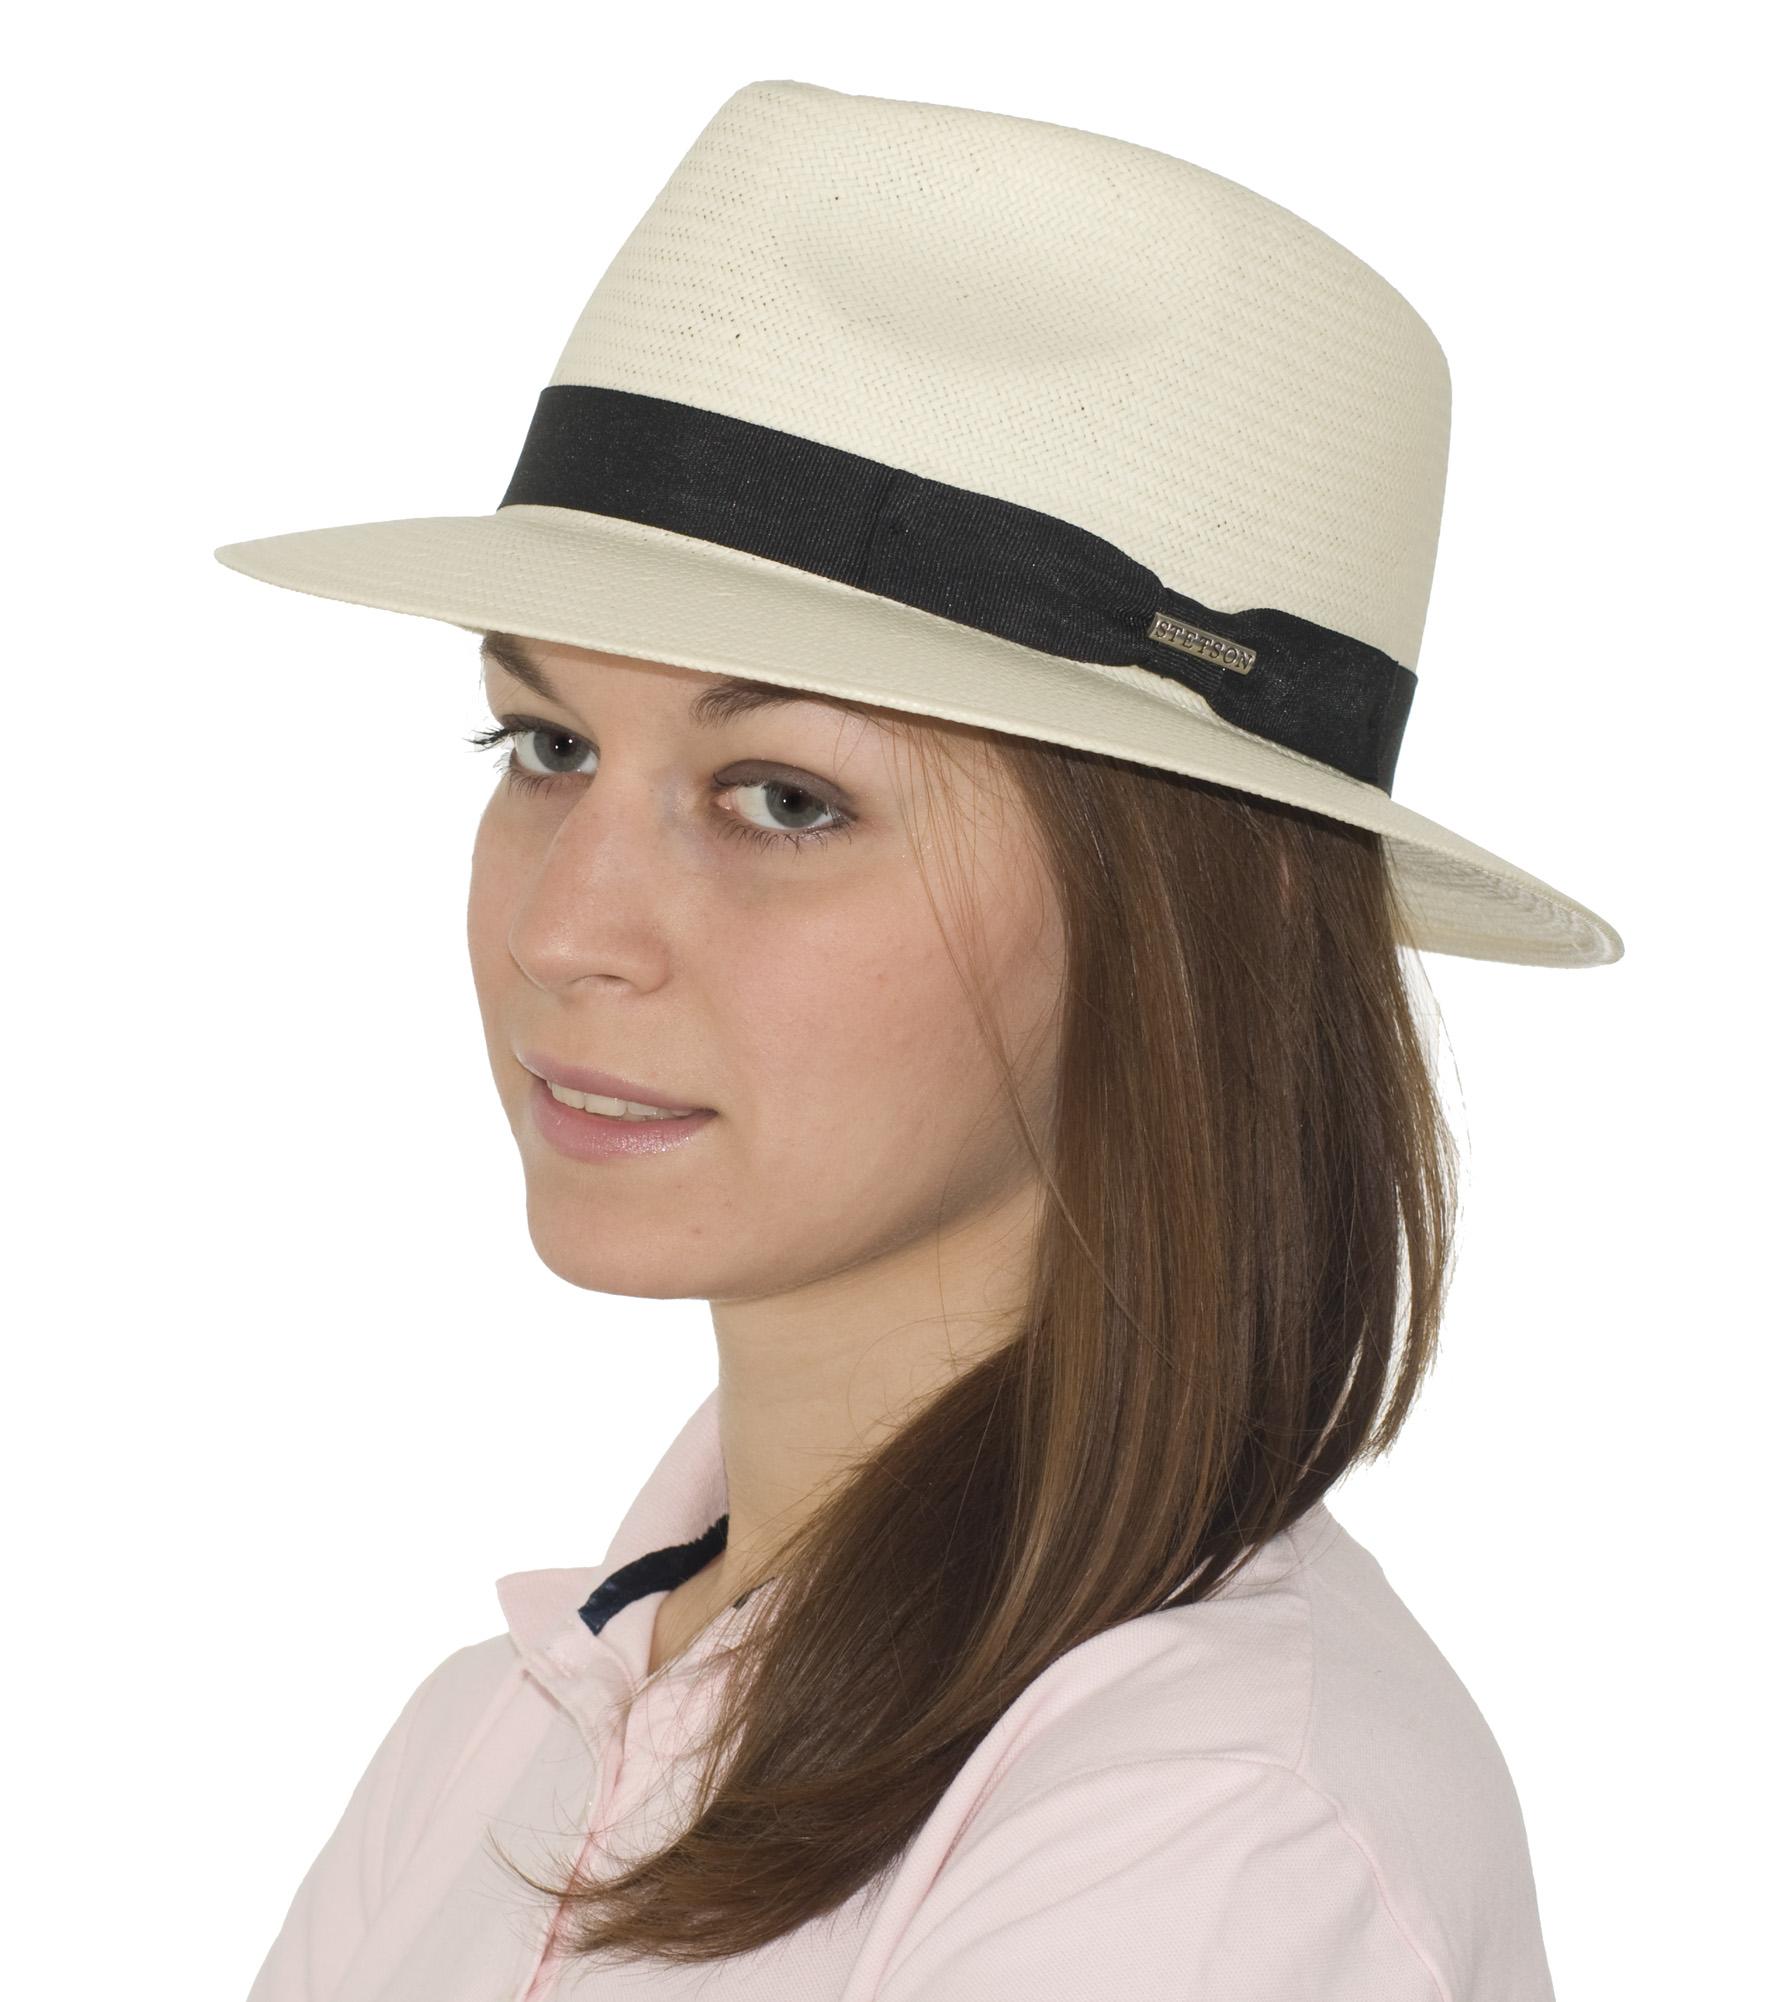 Klobouk Stetson Aripeka je klasický elegantní panama klobouk e3eaf5ee0e